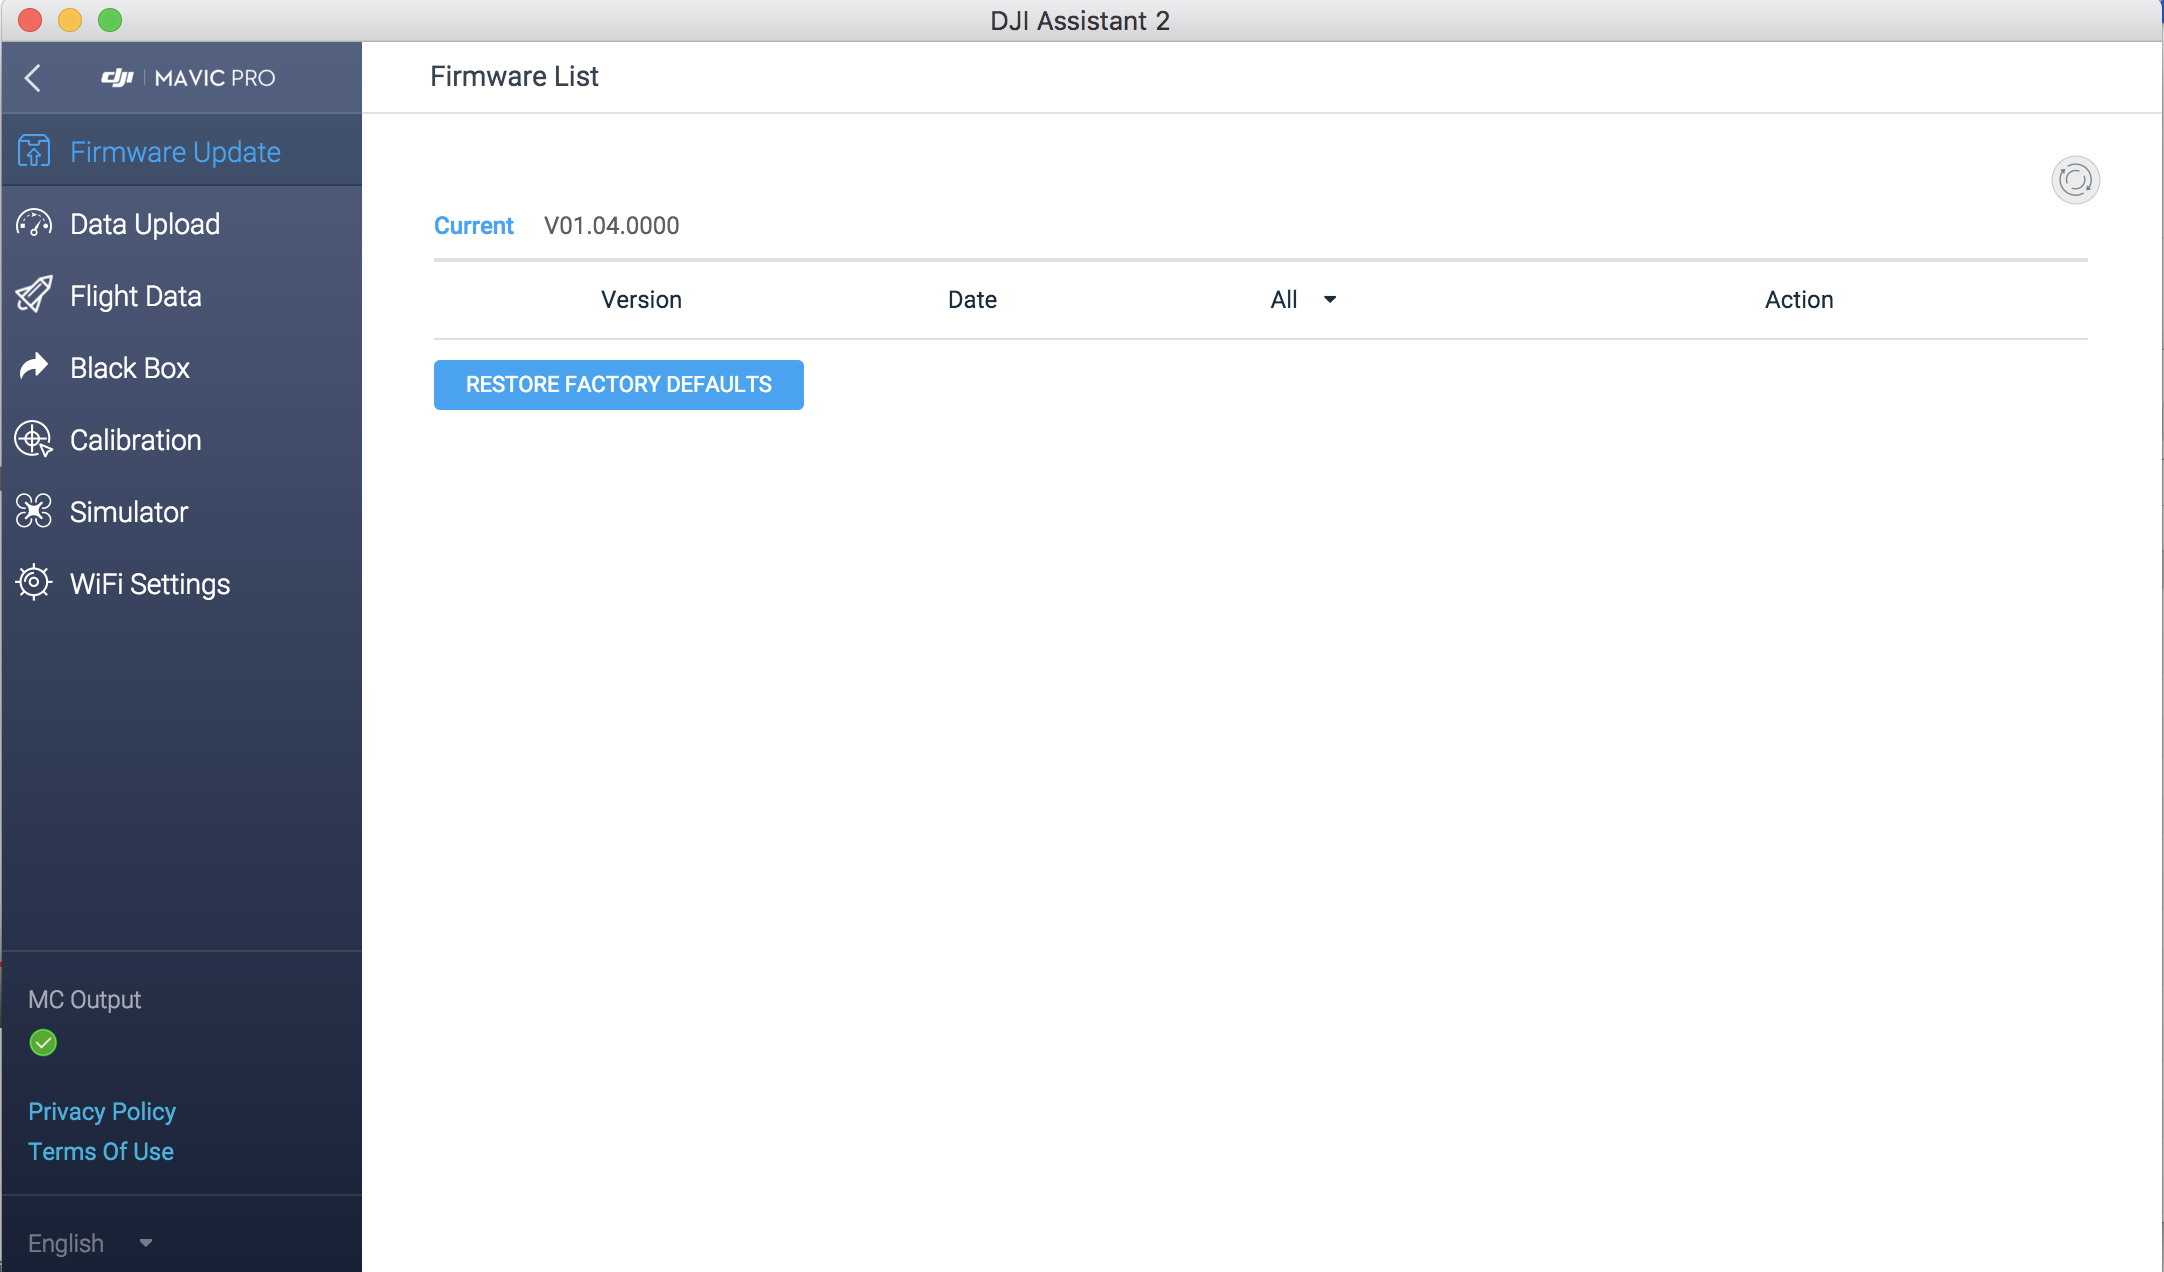 Firmwareupdate with Assistant Software | DJI FORUM